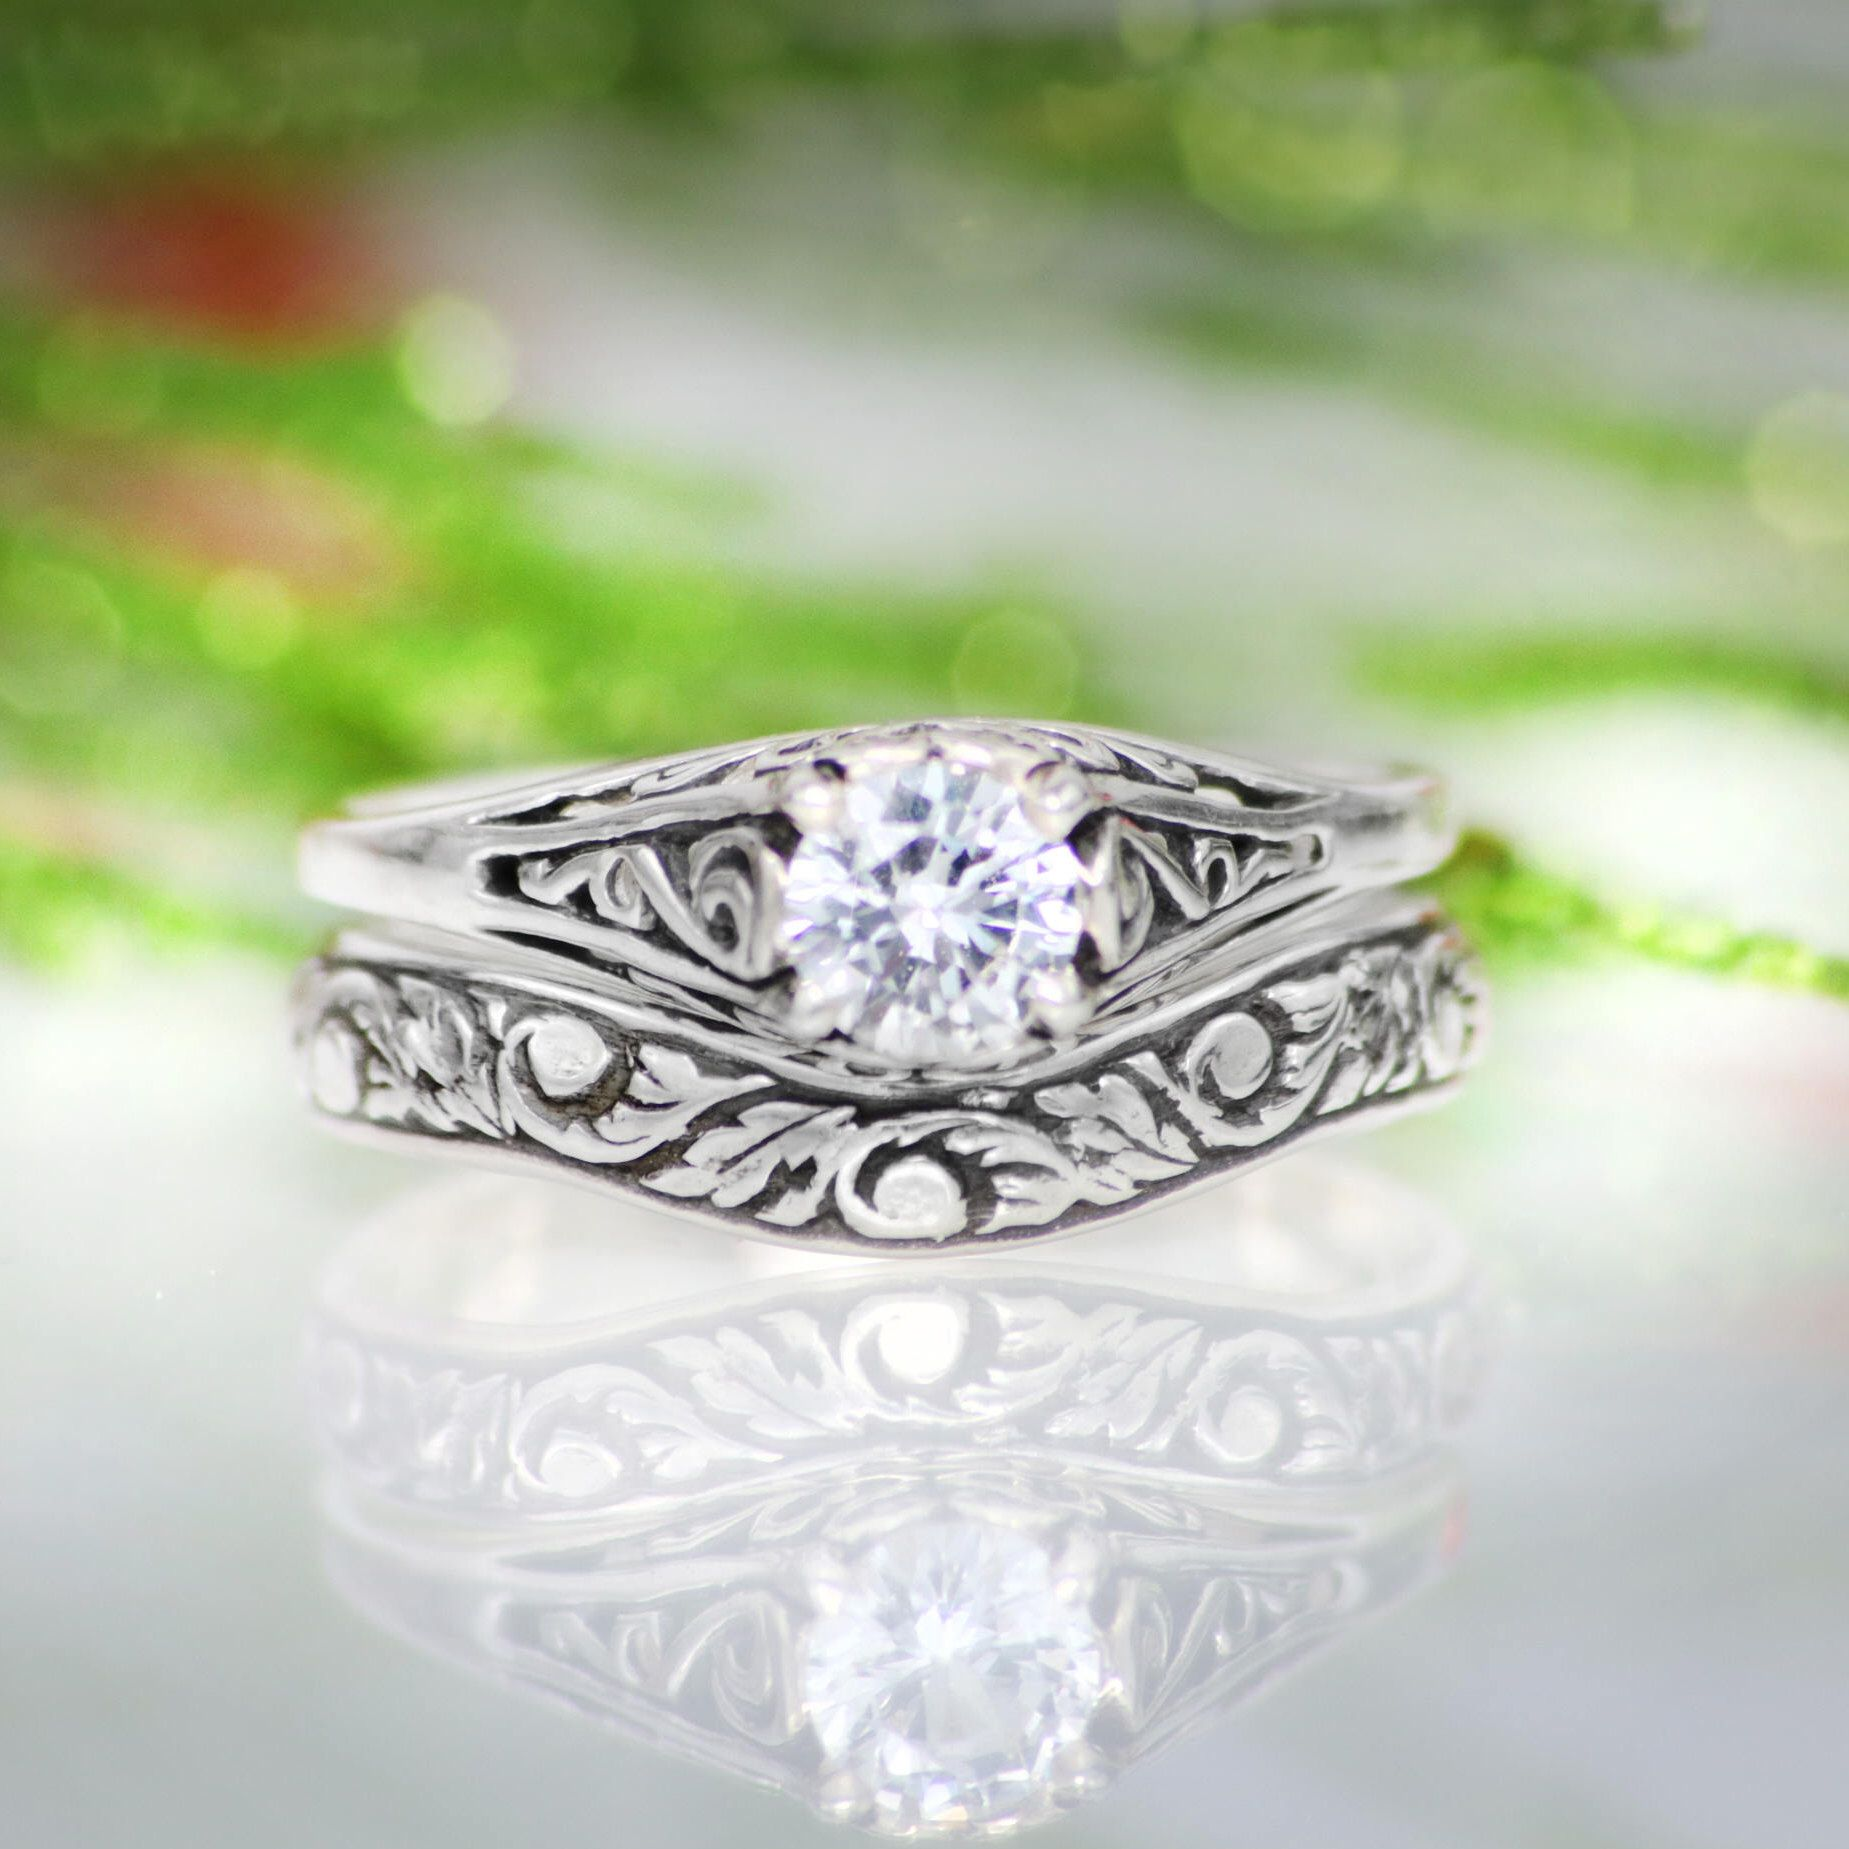 14+ Silver dainty wedding rings info